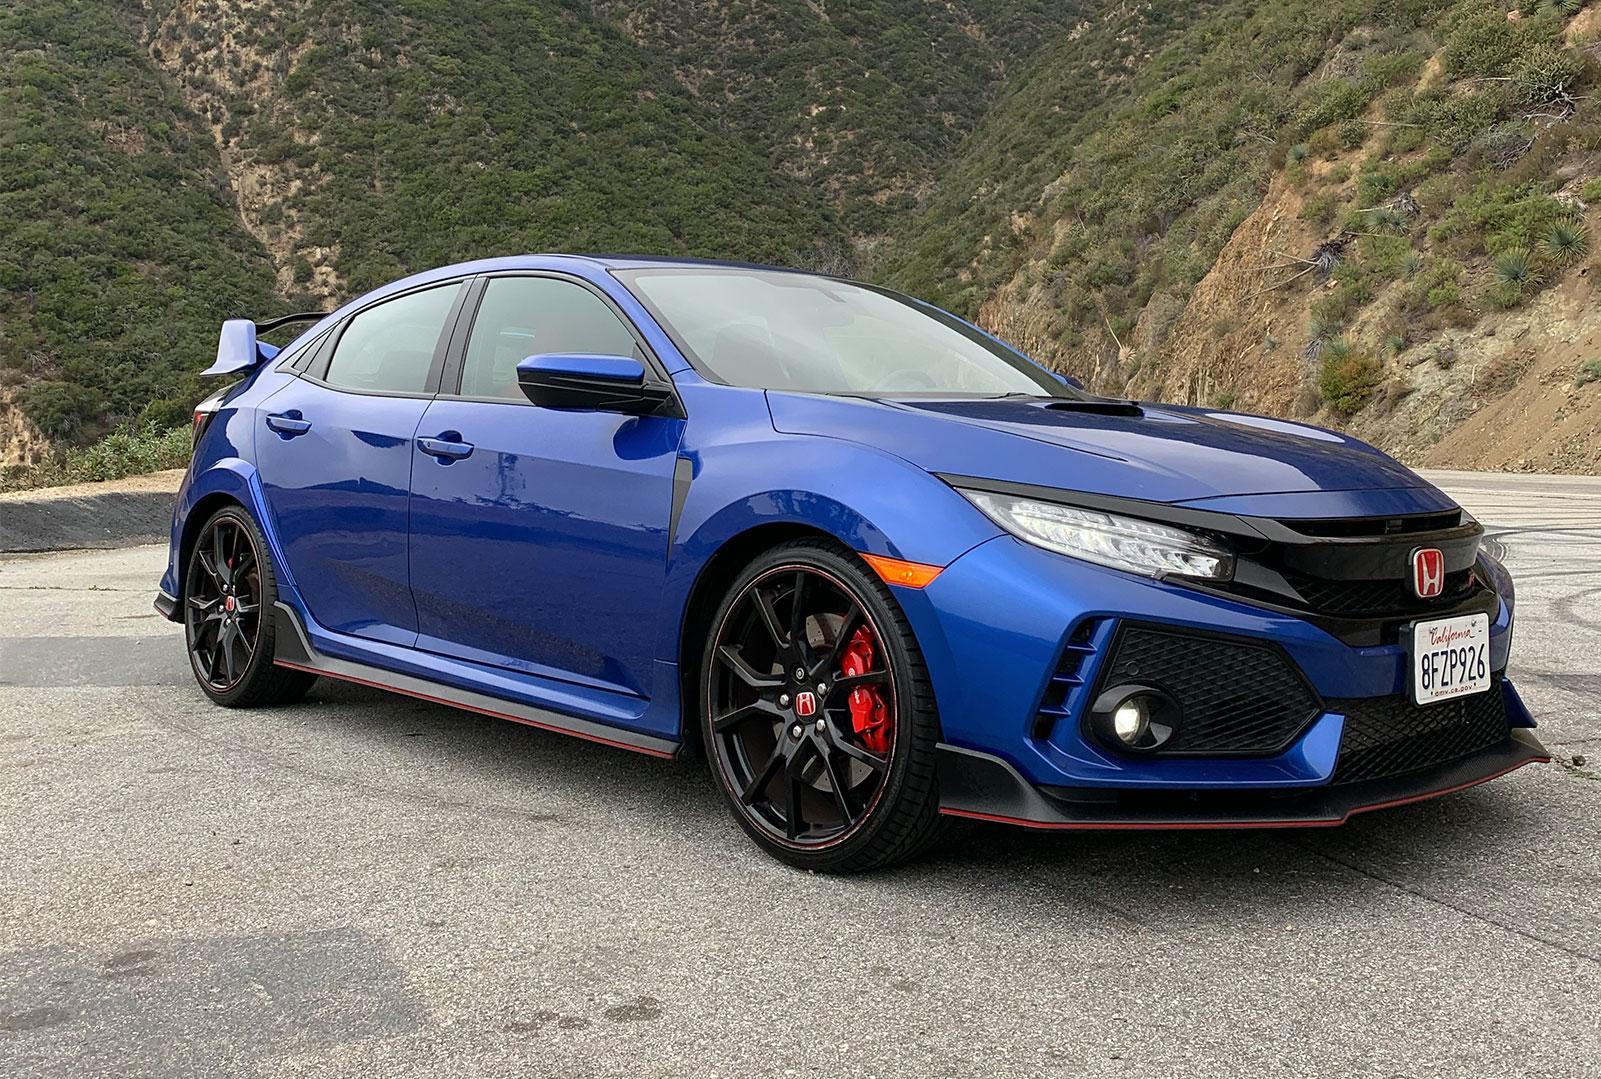 Road Test: 2018 Honda Civic Type-R - New Speed Cars